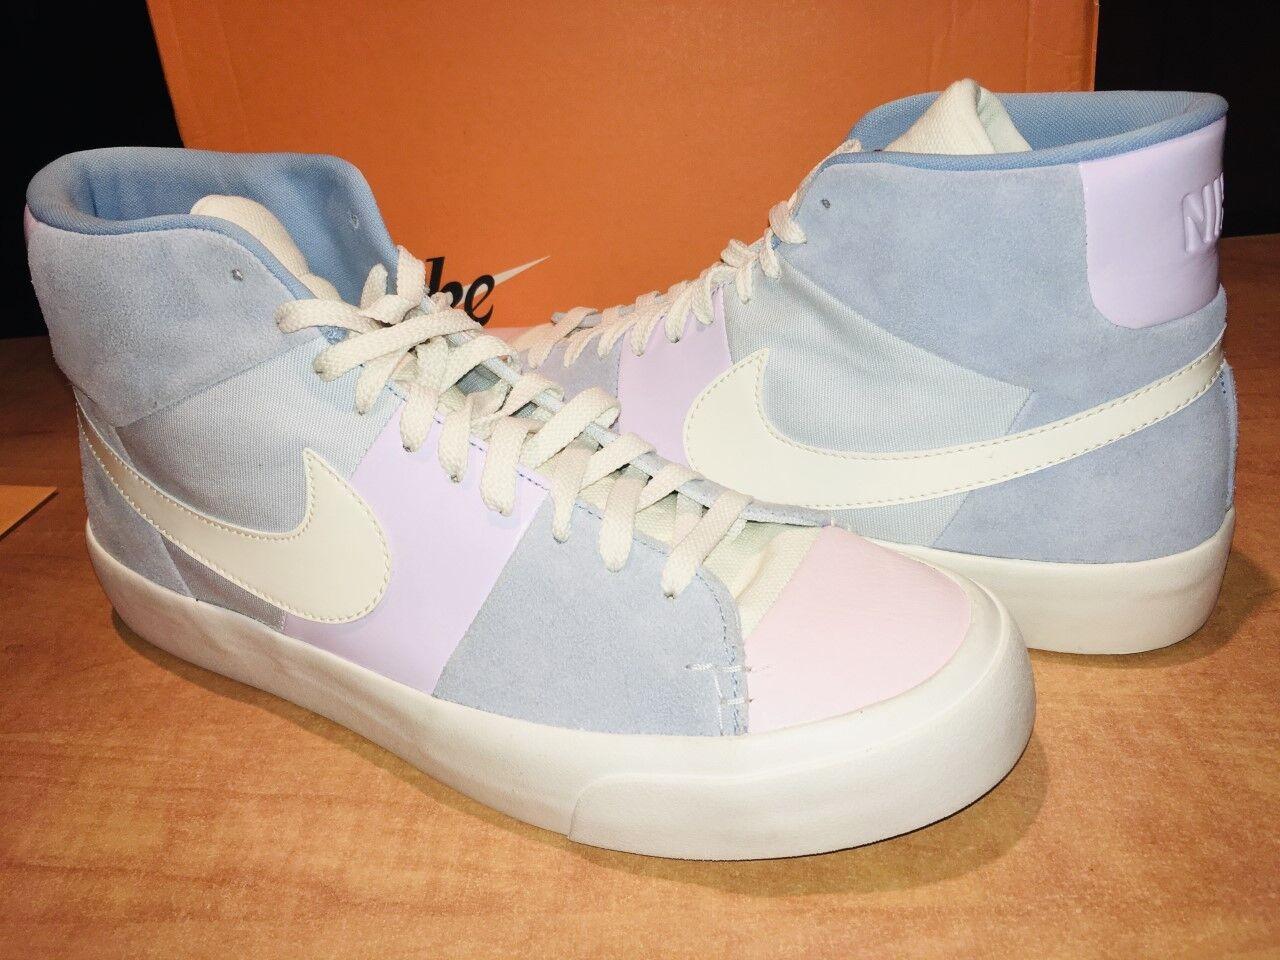 Nike blazer royal easter QS AO2368-600 size 11.5 men new